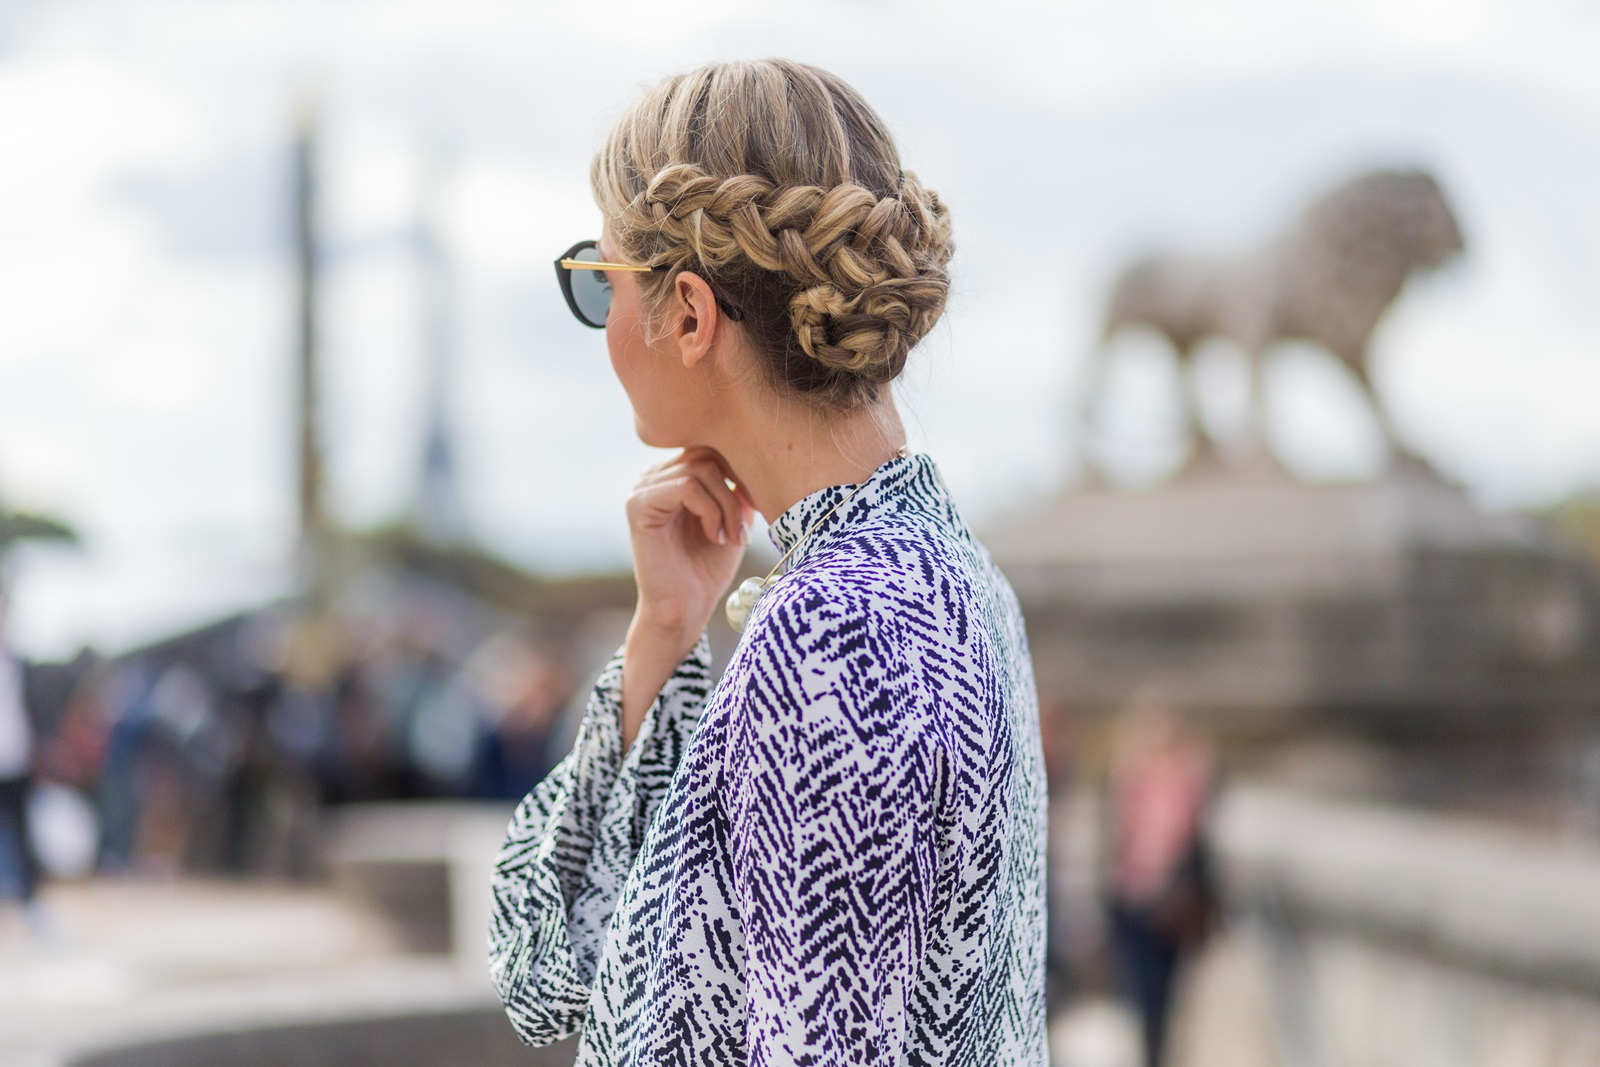 Hair by Anne Demollier